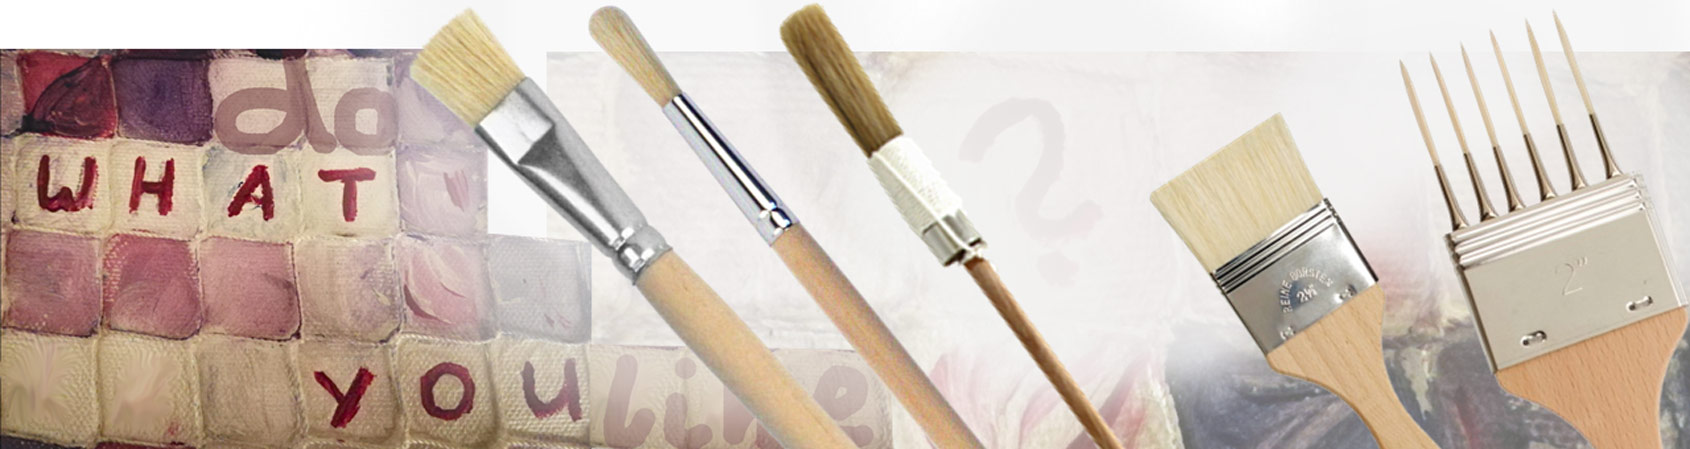 K-nstlerpinsel-aus-Naturborsten-und-Synthetikborsten